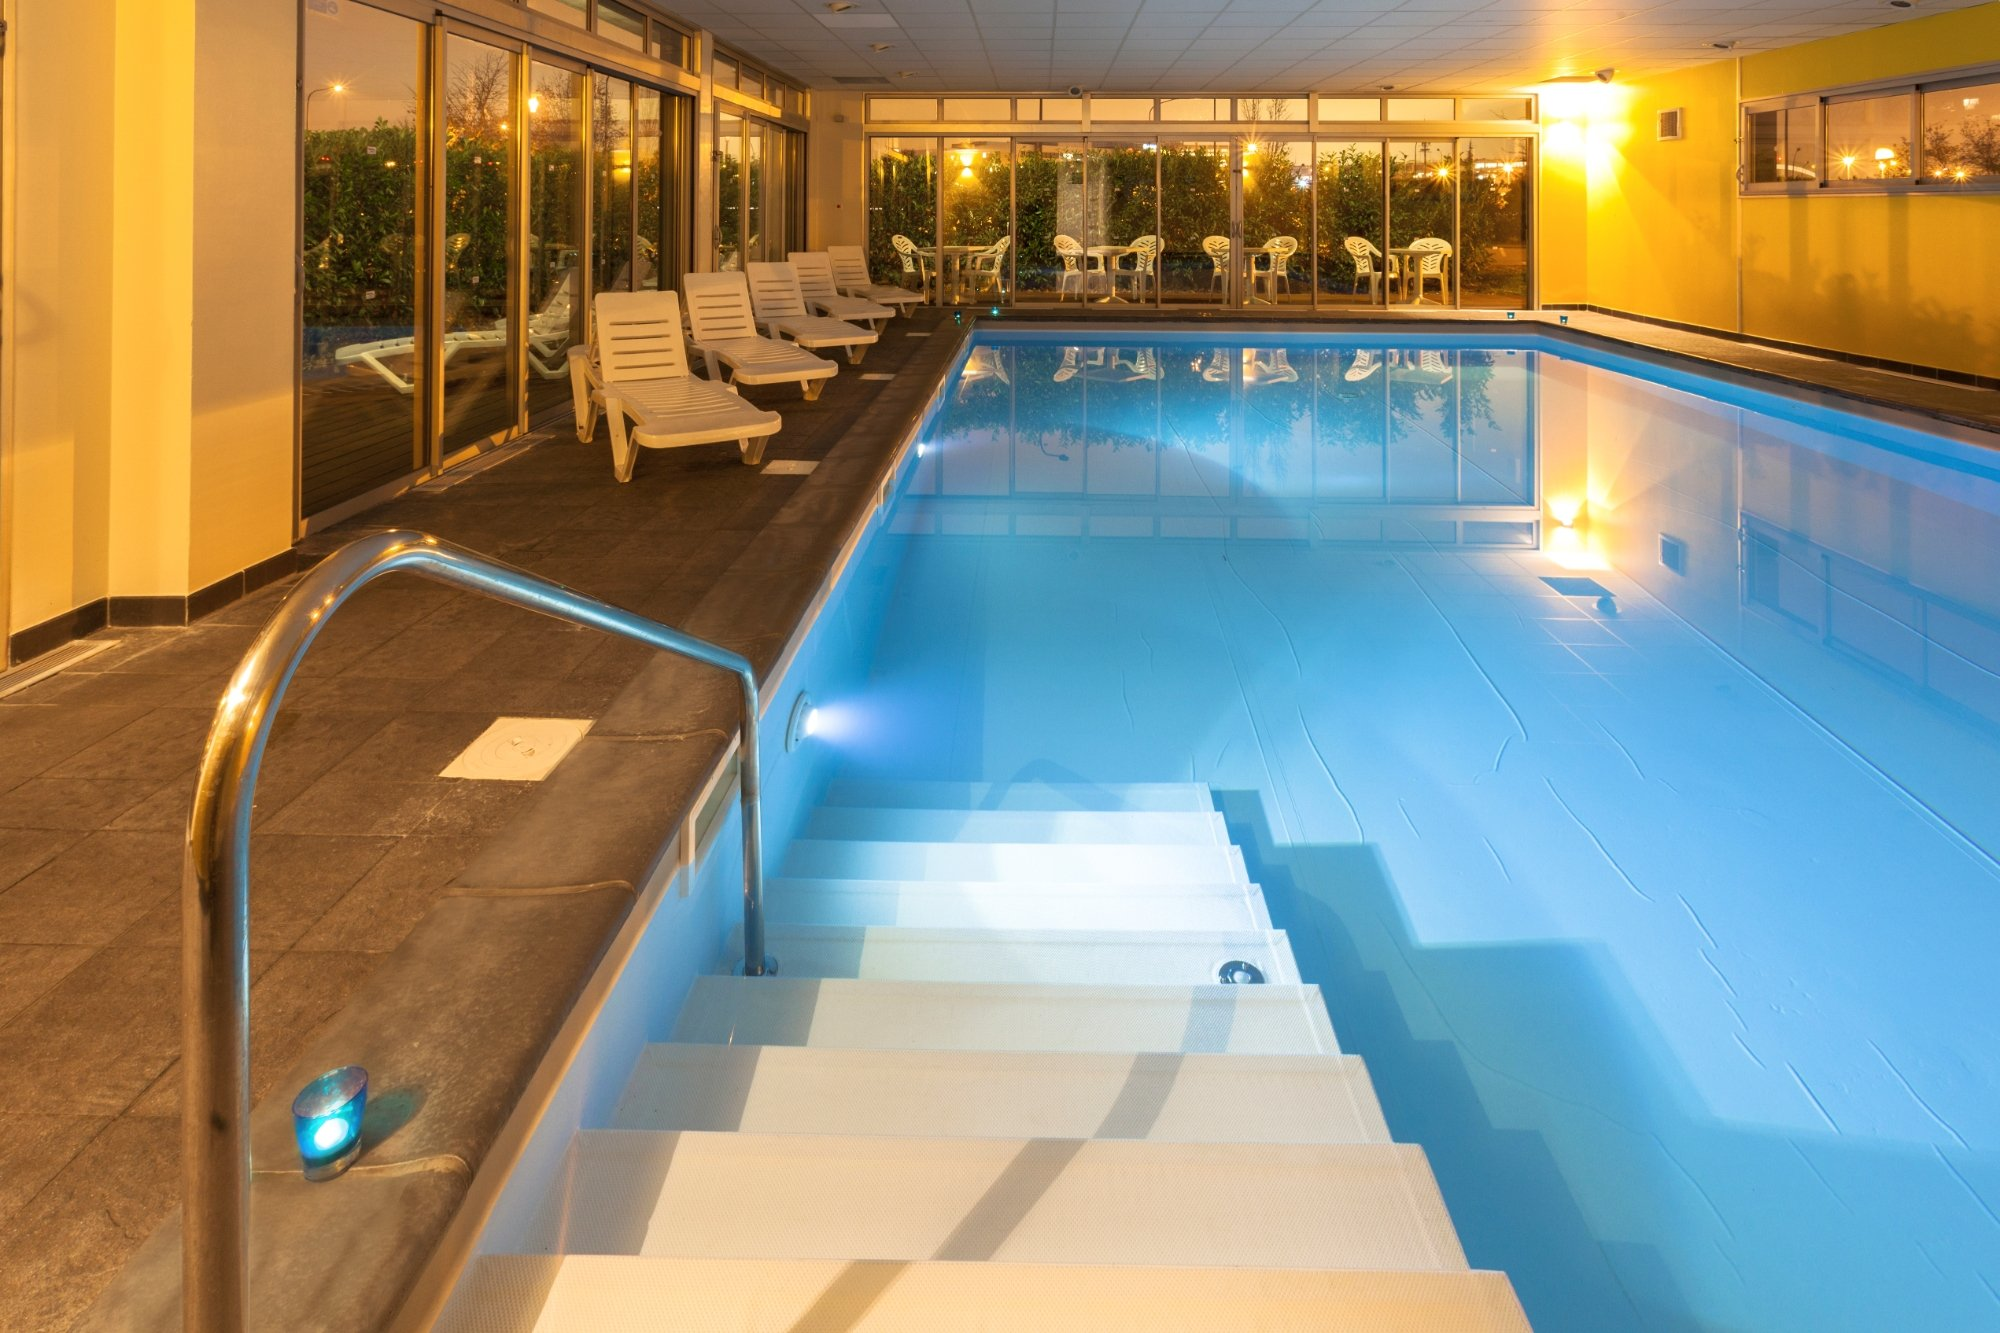 Nemea Appart'hotel Residence Saint-Martin